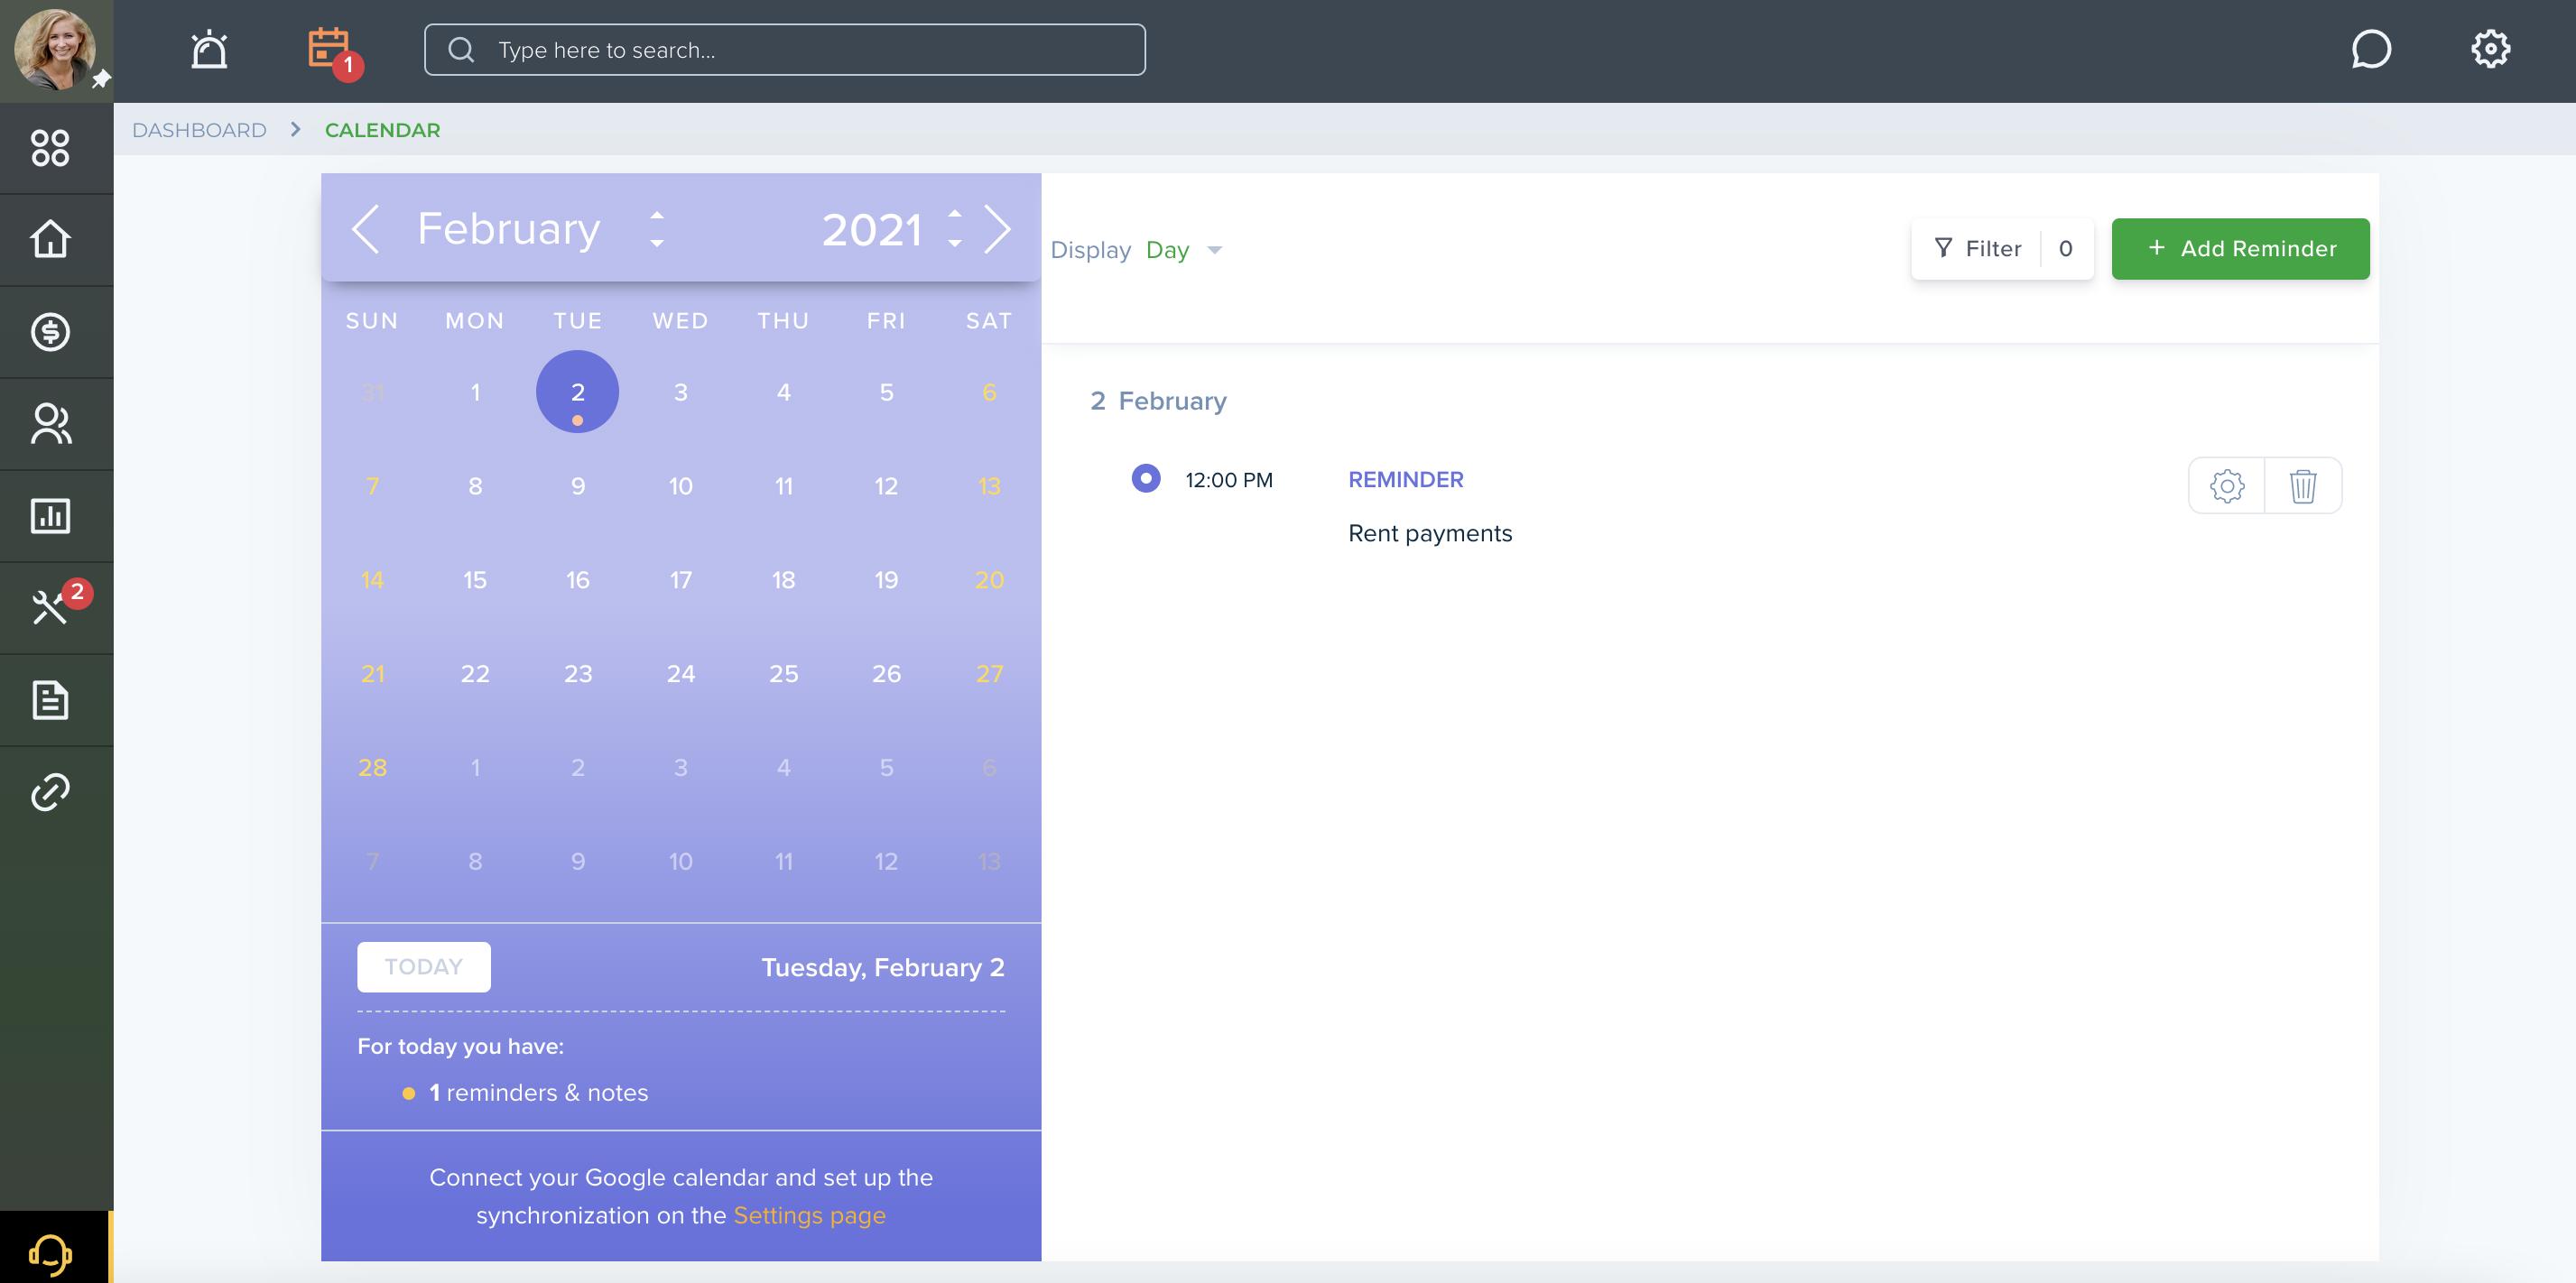 TenantCloud calendar notifications and reminders